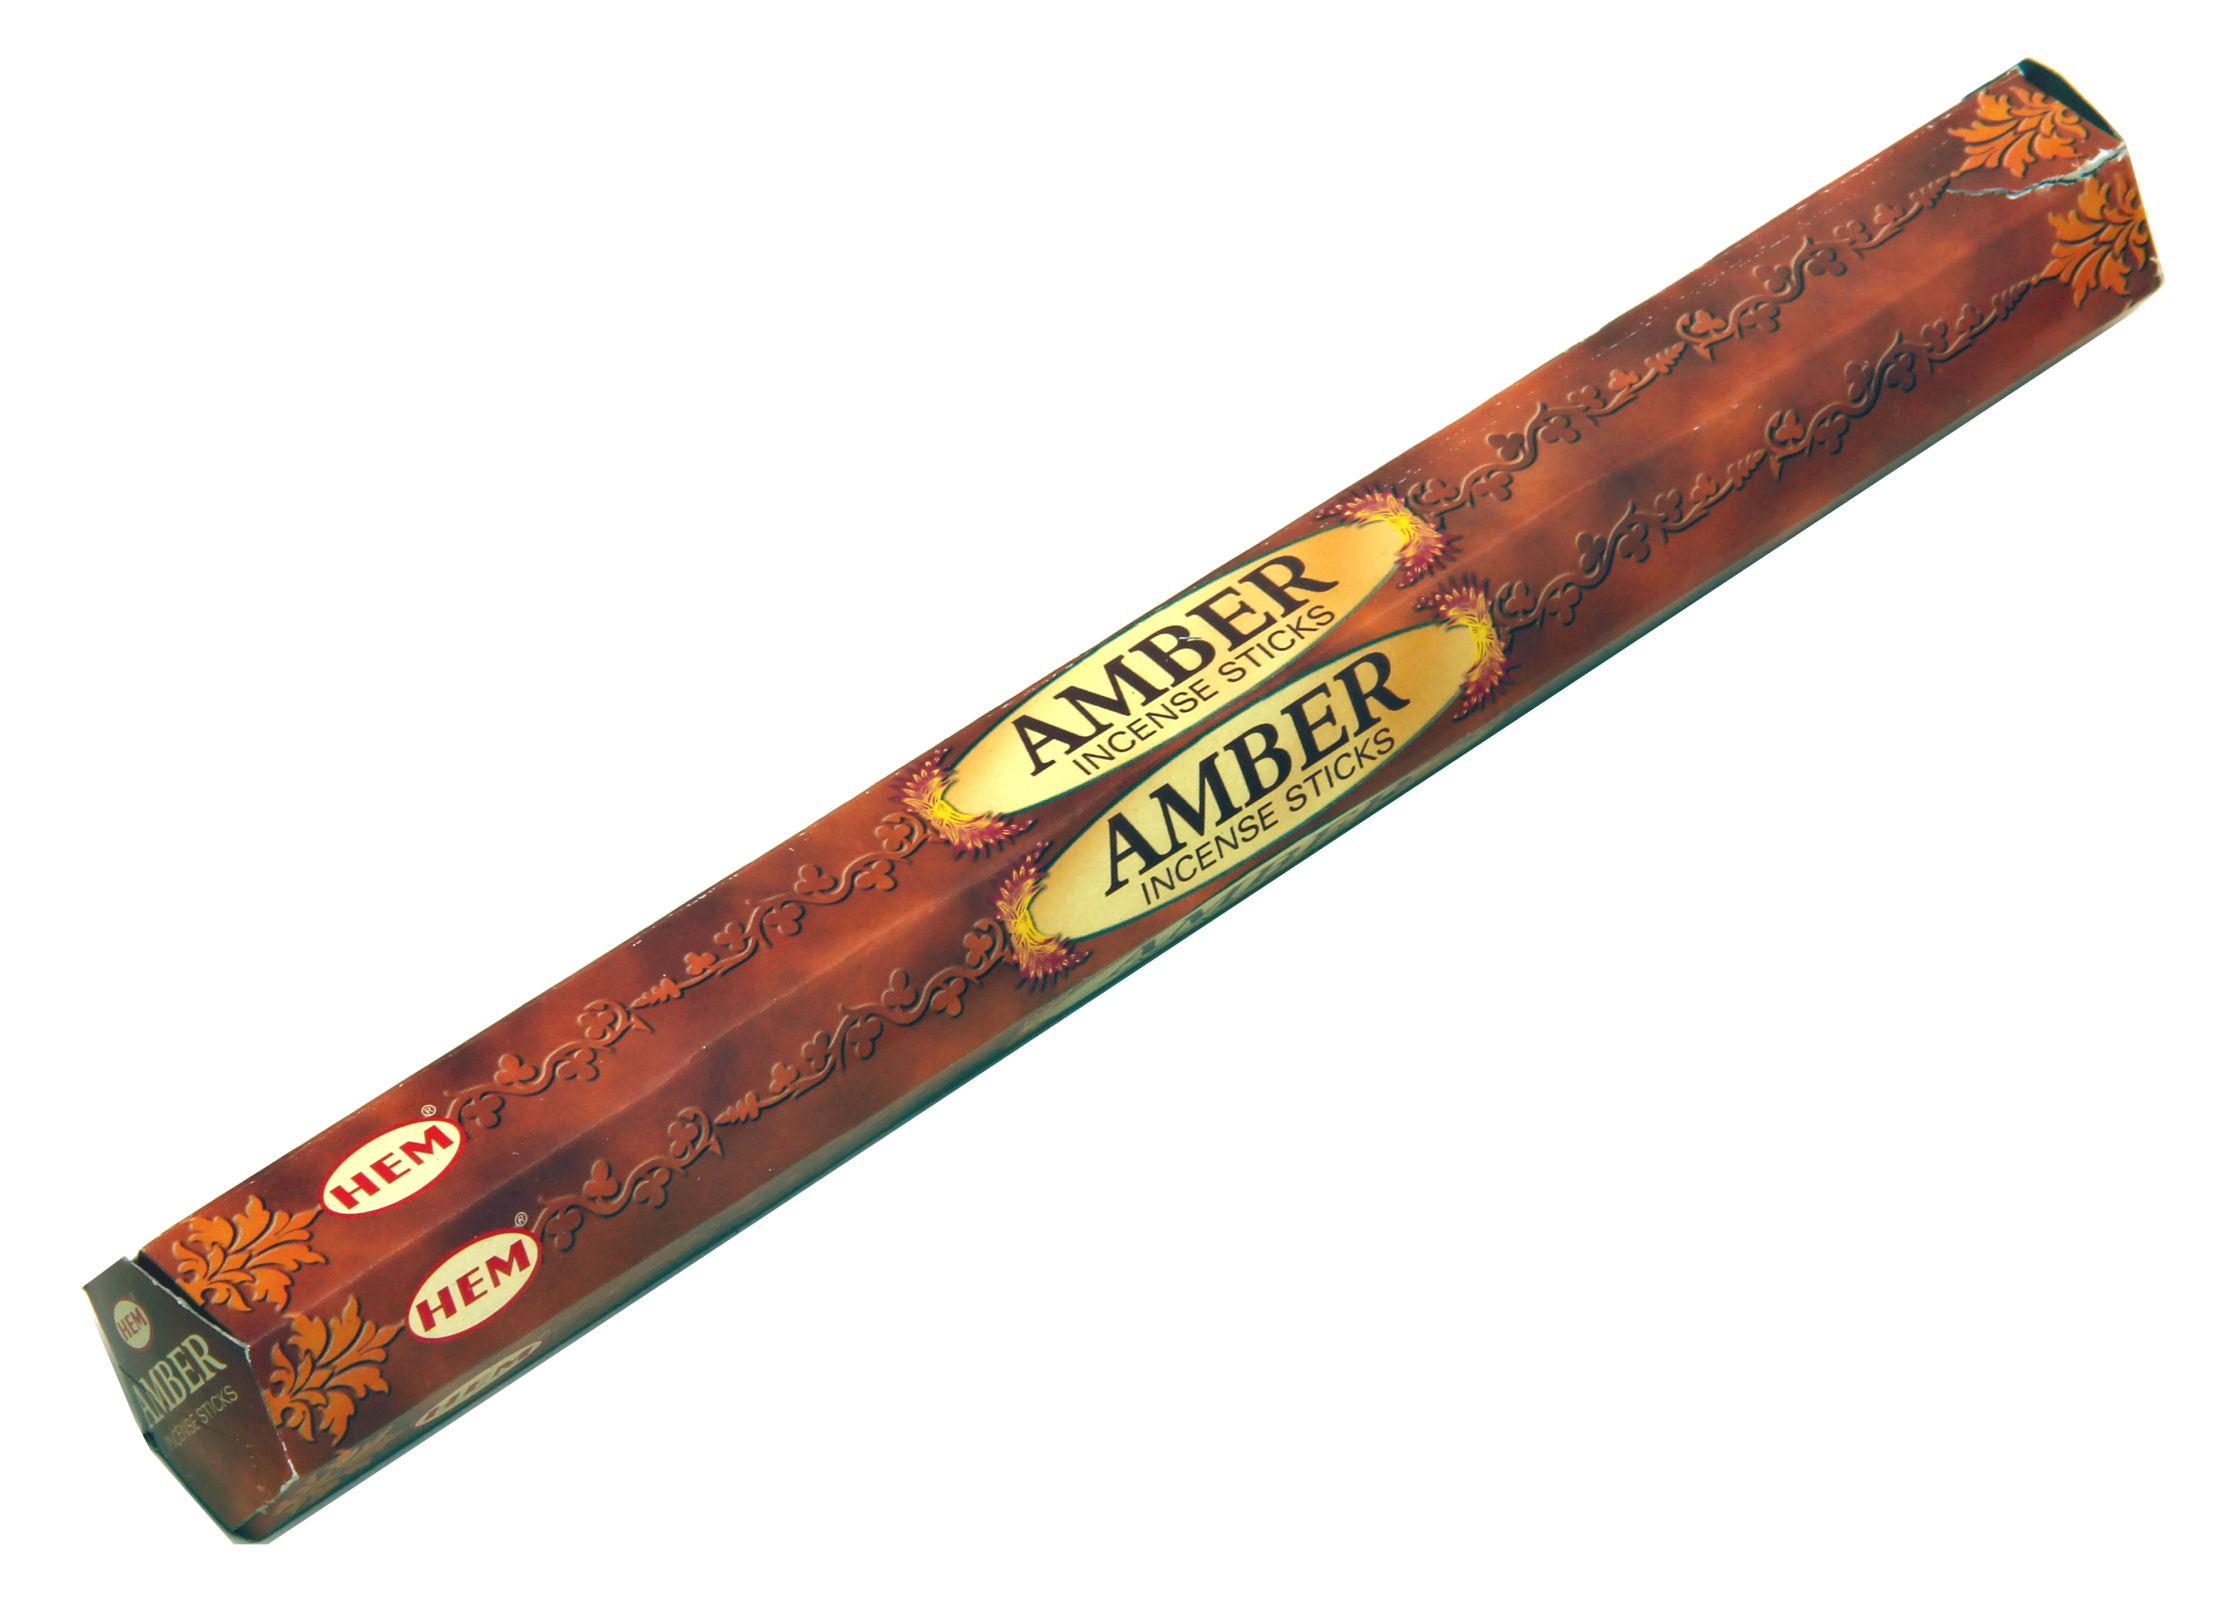 HEM Räucherstäbchen Amber 20g Hexa Packung  Ca. 20 Incence Sticks